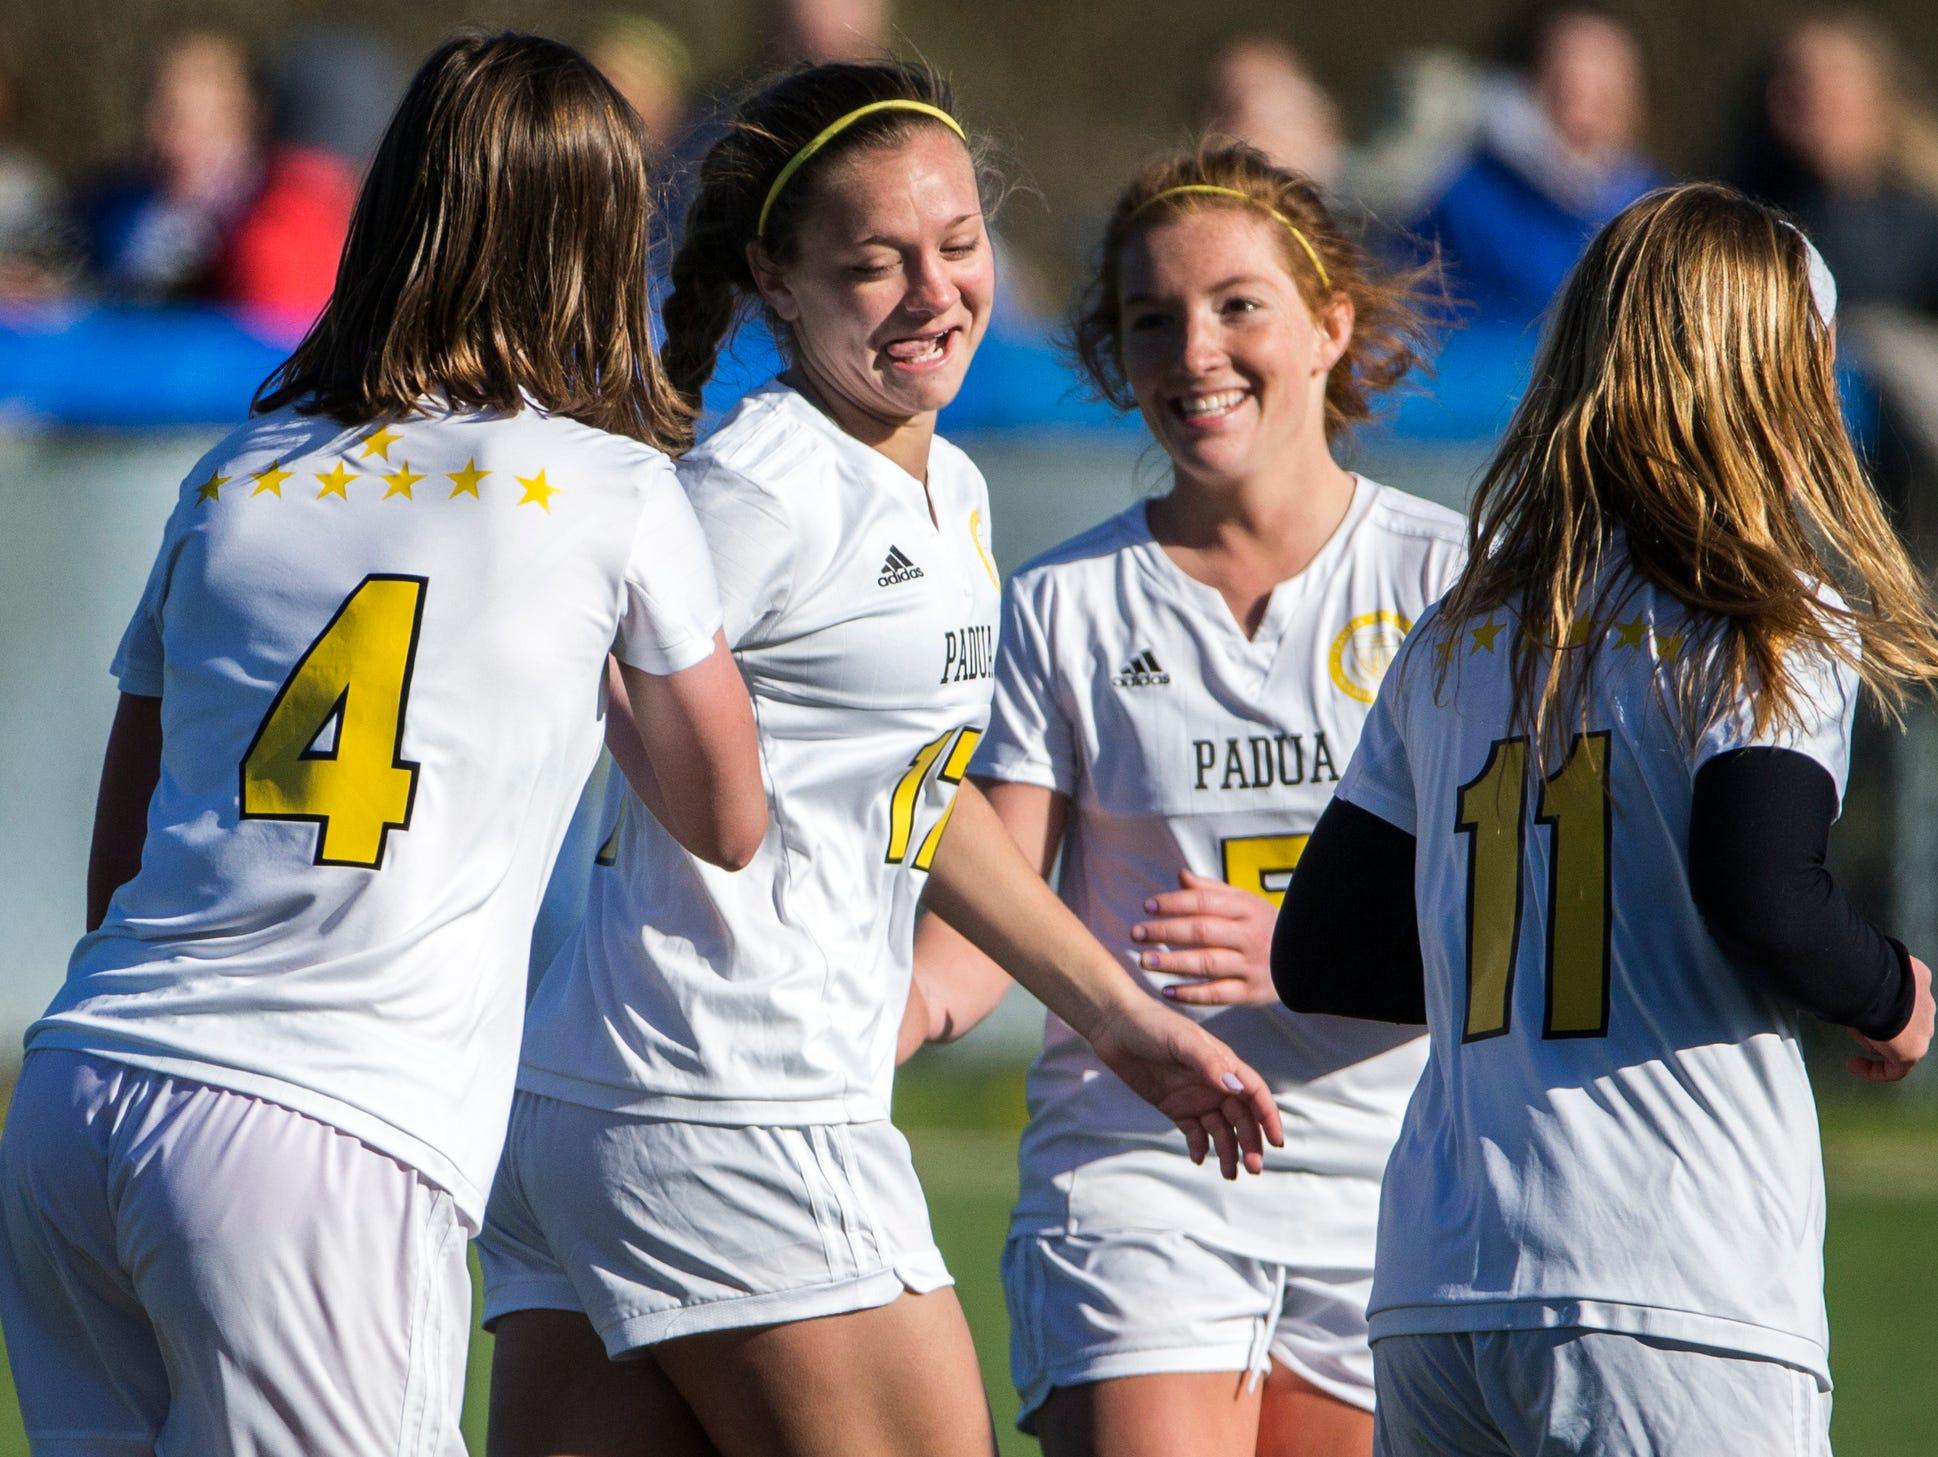 Padua's Lindsay Machamer (No. 17) celebrates with teammate Emilia Ryjewski (No. 4) after Ryjewski's goal in the second half of Padua's 2-0 win over Caesar Rodney at the Hockessin Soccer Club on Tuesday afternoon.